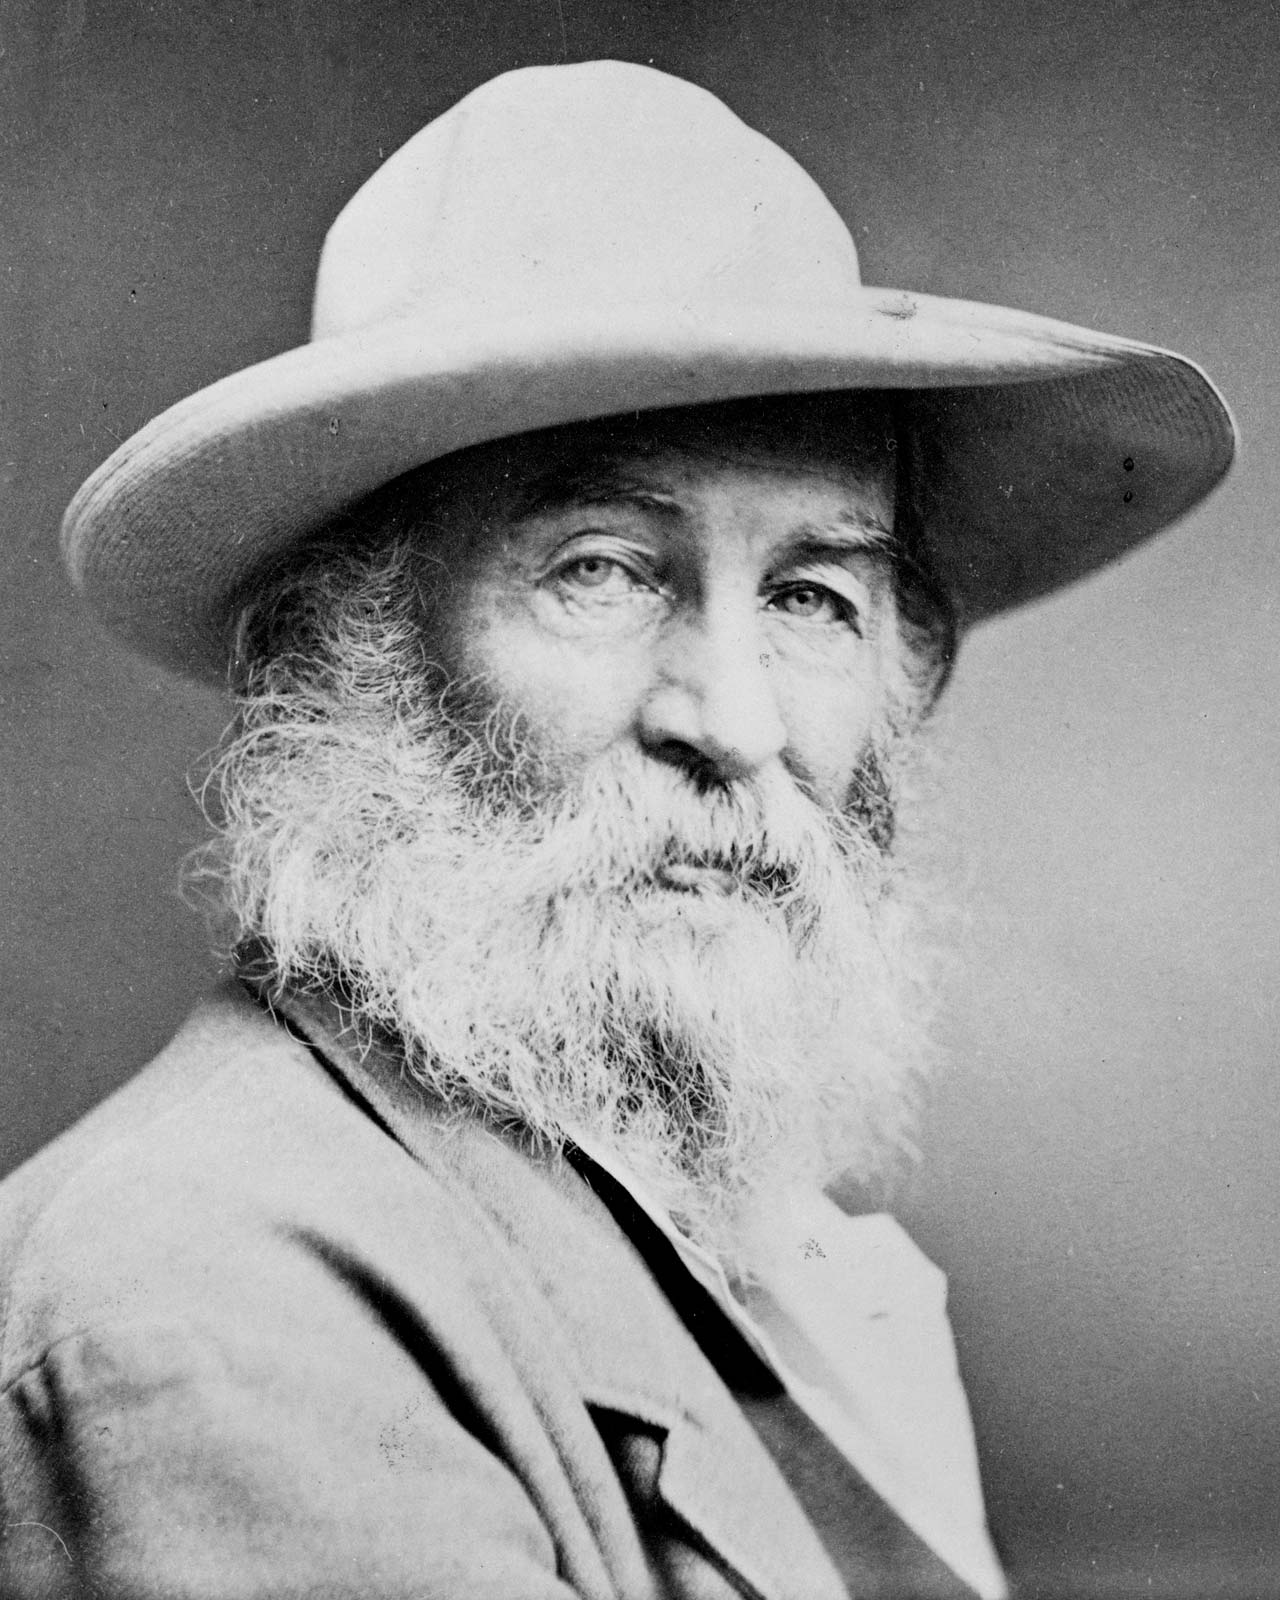 電影中的惠特曼Walt Whitman詩—少男初體驗 L.I.E.,長島愛與死Love and death in long island,不羈吧!男孩The History Boys @東南亞投資報告